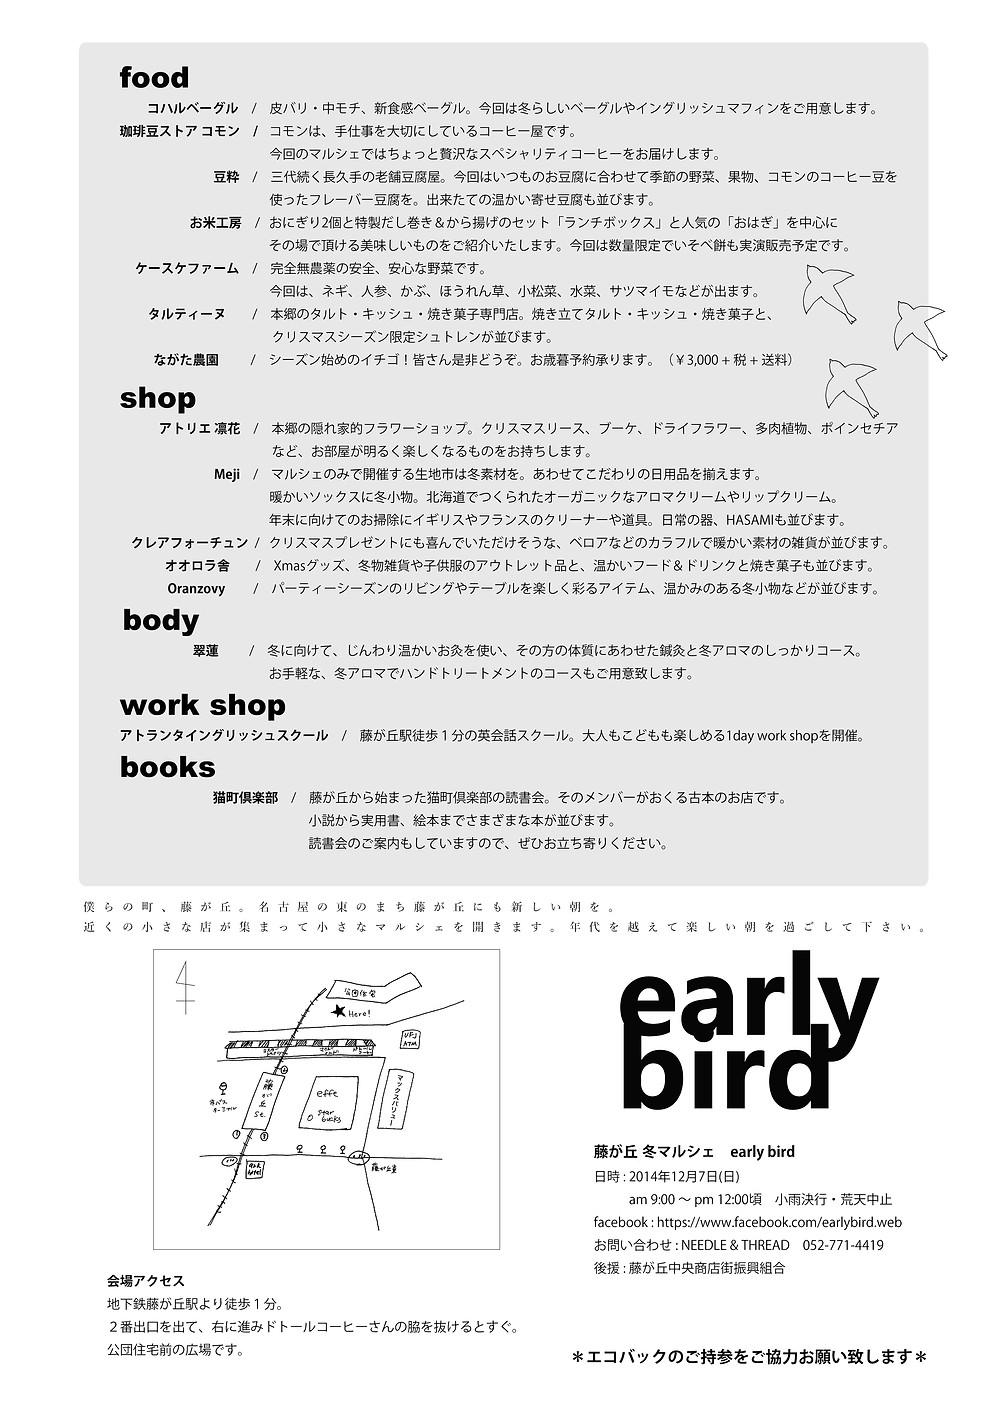 earlybird-back141207入稿.jpg